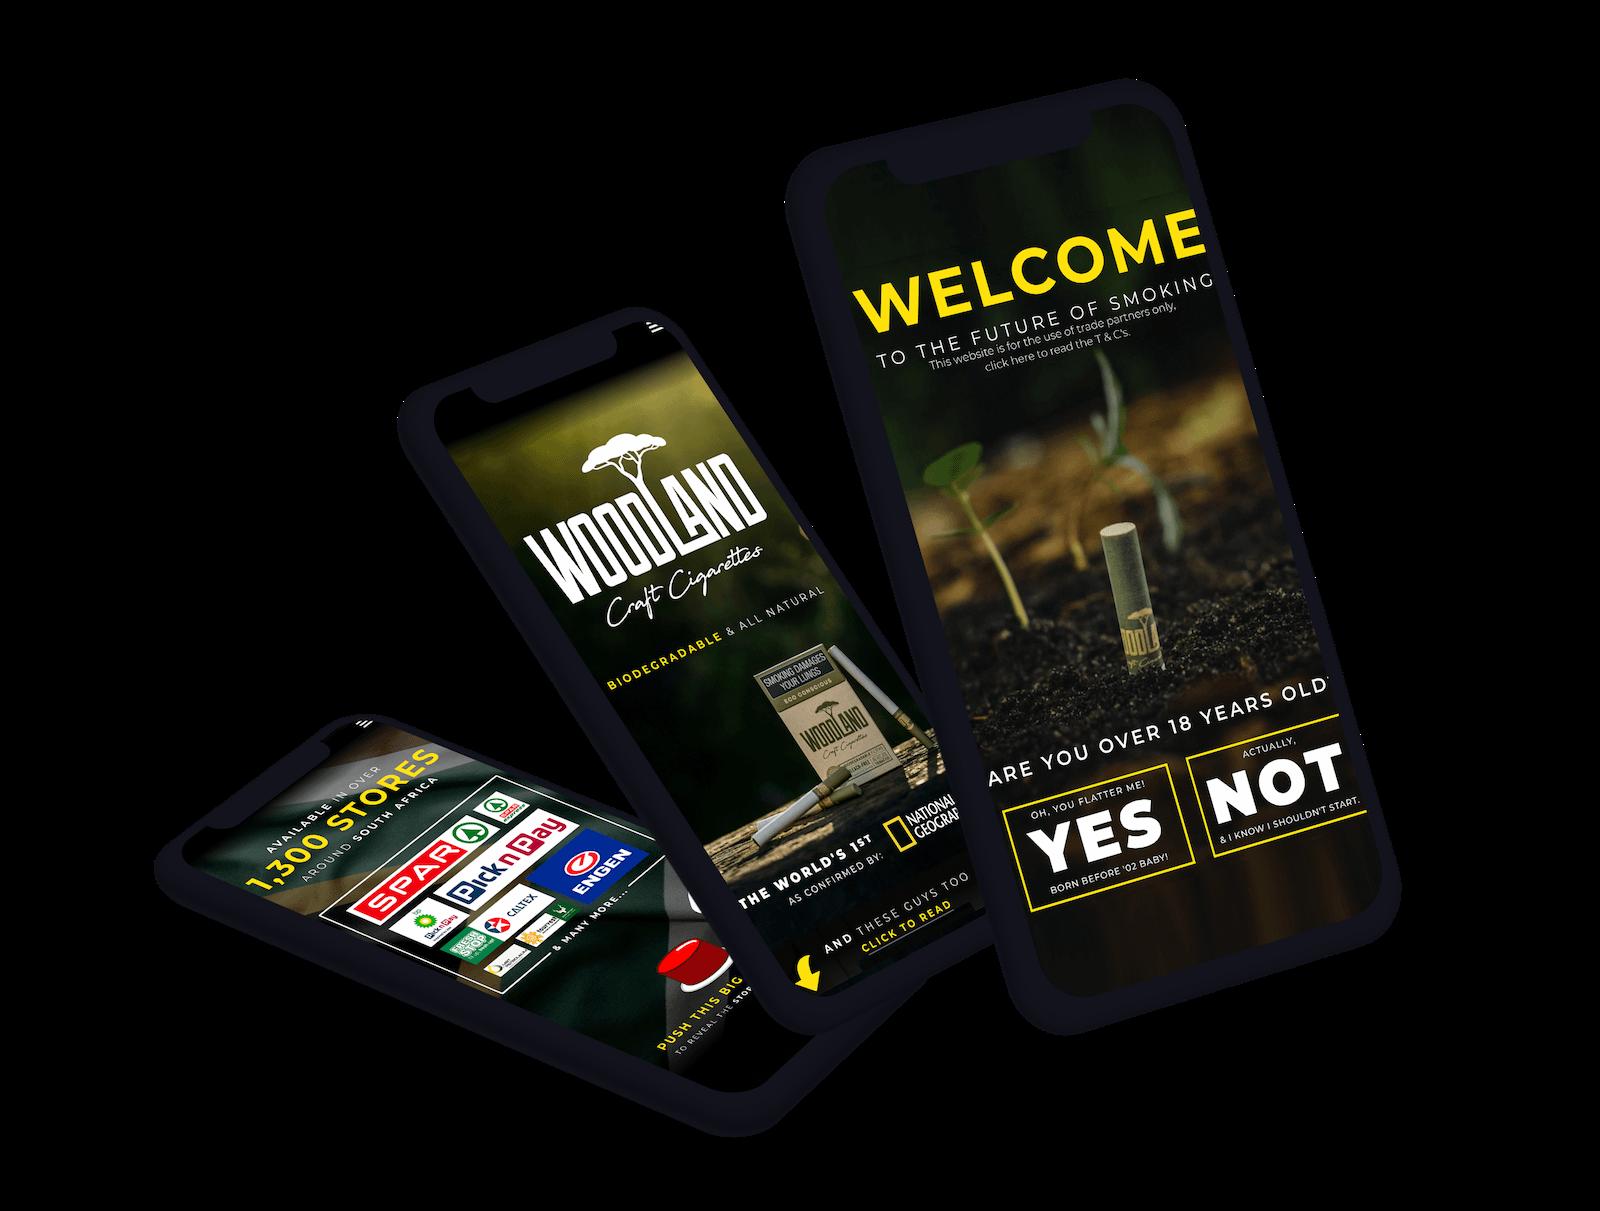 woodland cigarettes website promo